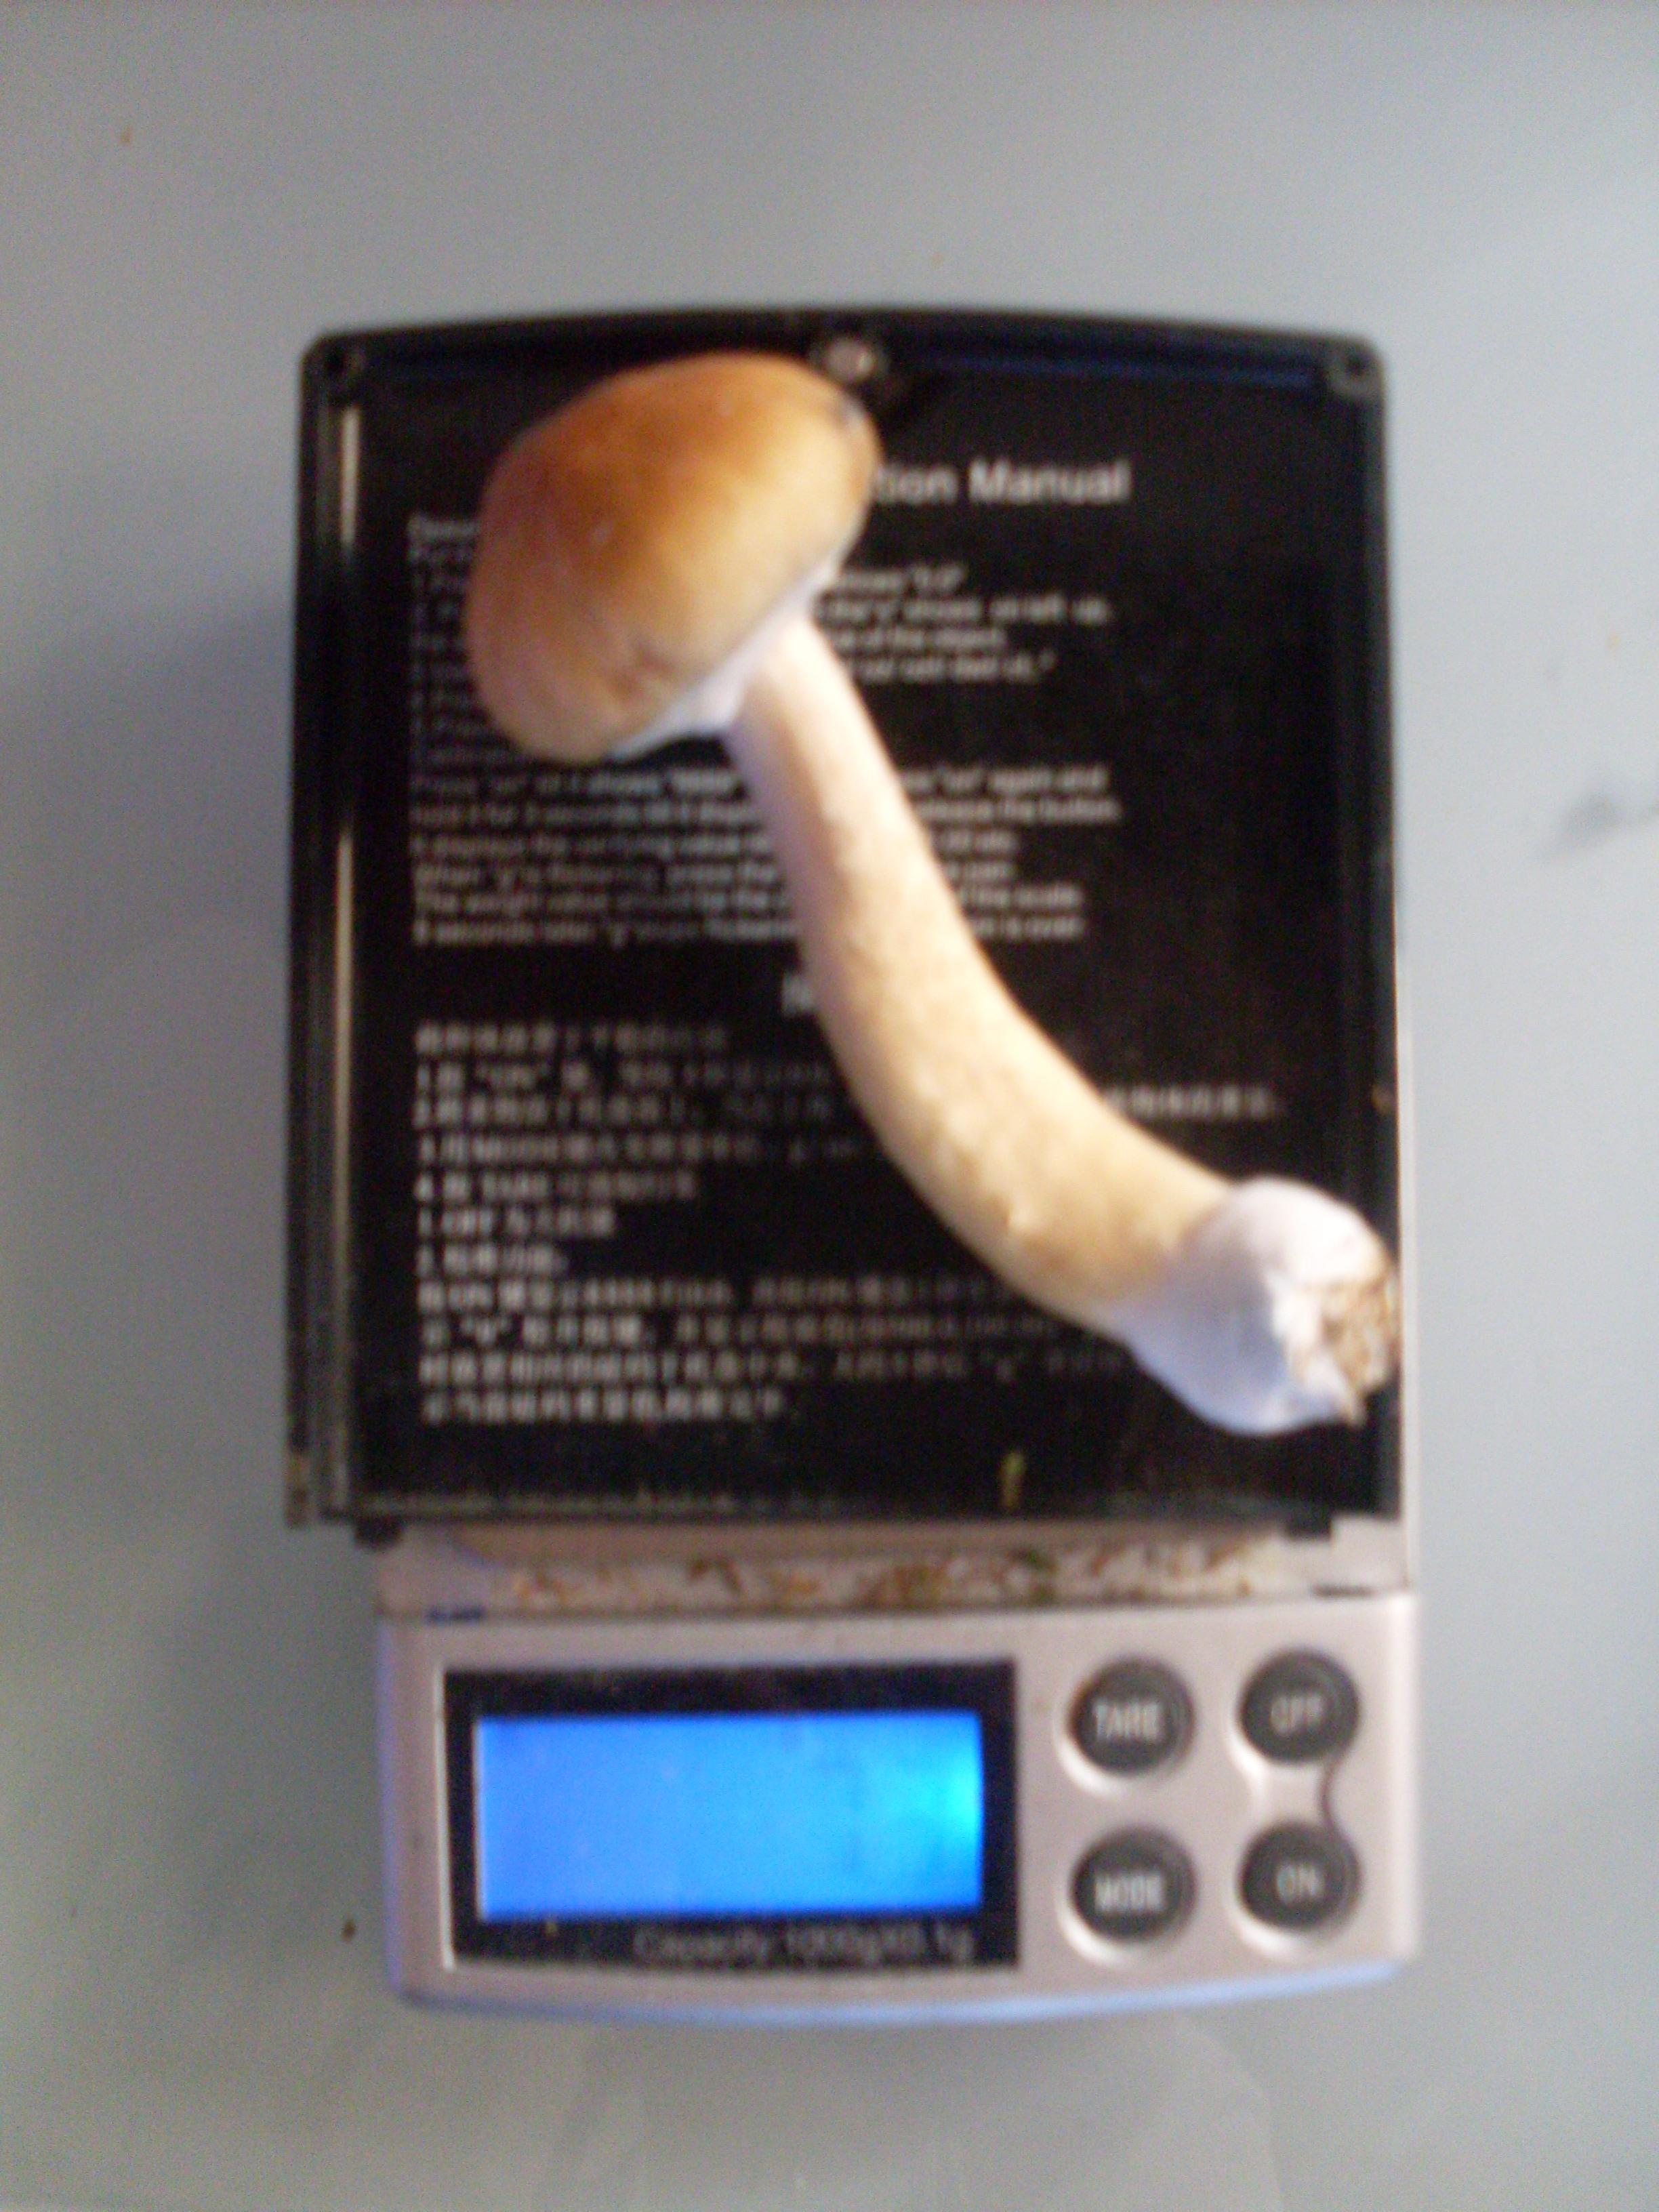 My Golden Teacher grow - PF-tek pint jars - Page 2 - Fungi: Magic